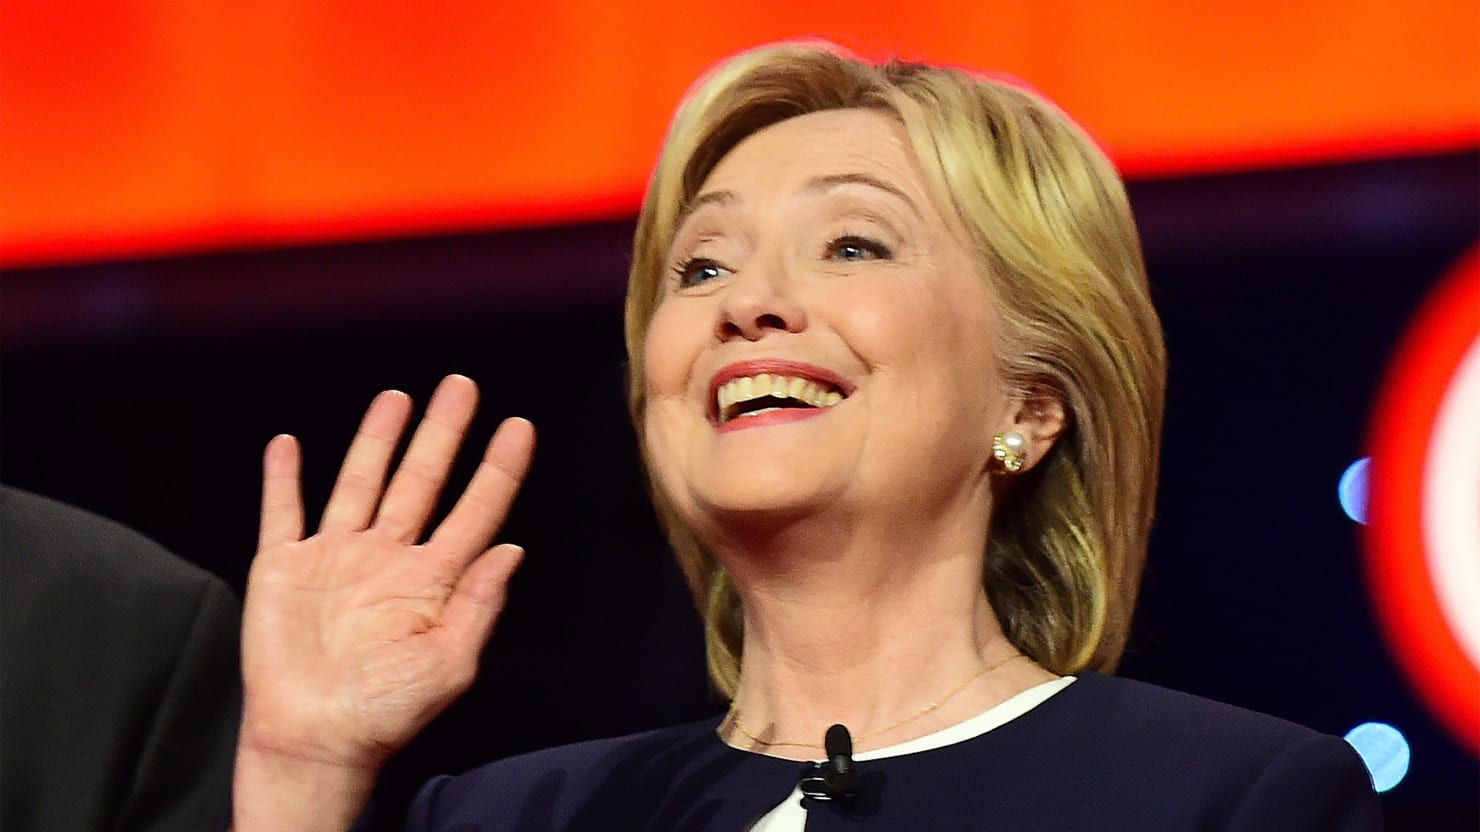 We Still Won't Have a Female President